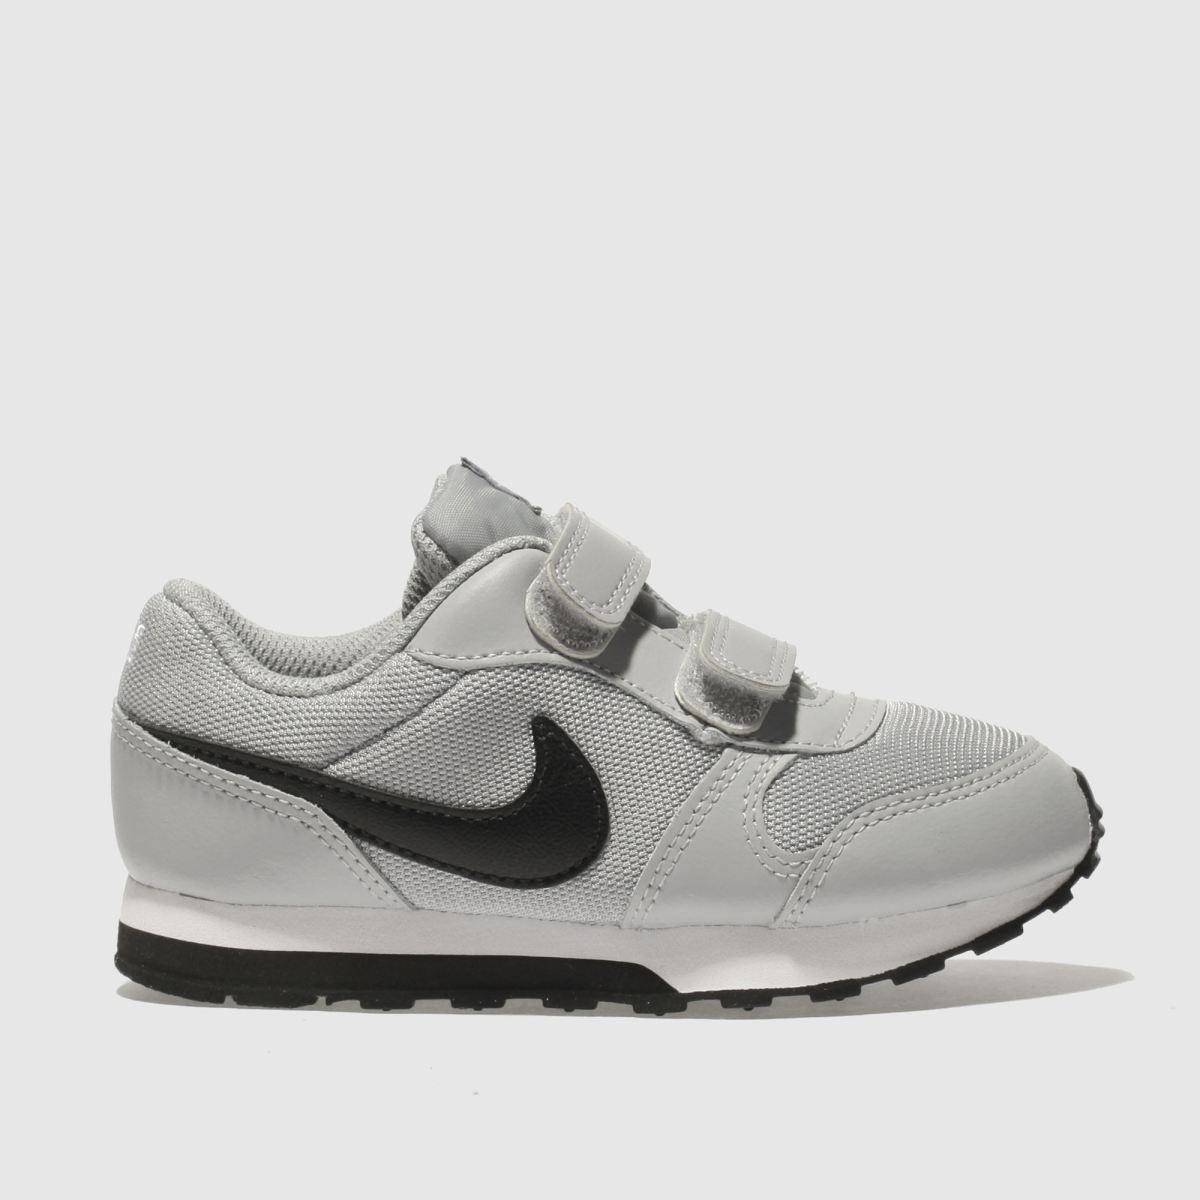 Nike Light Grey Md Runner 2 Trainers Toddler